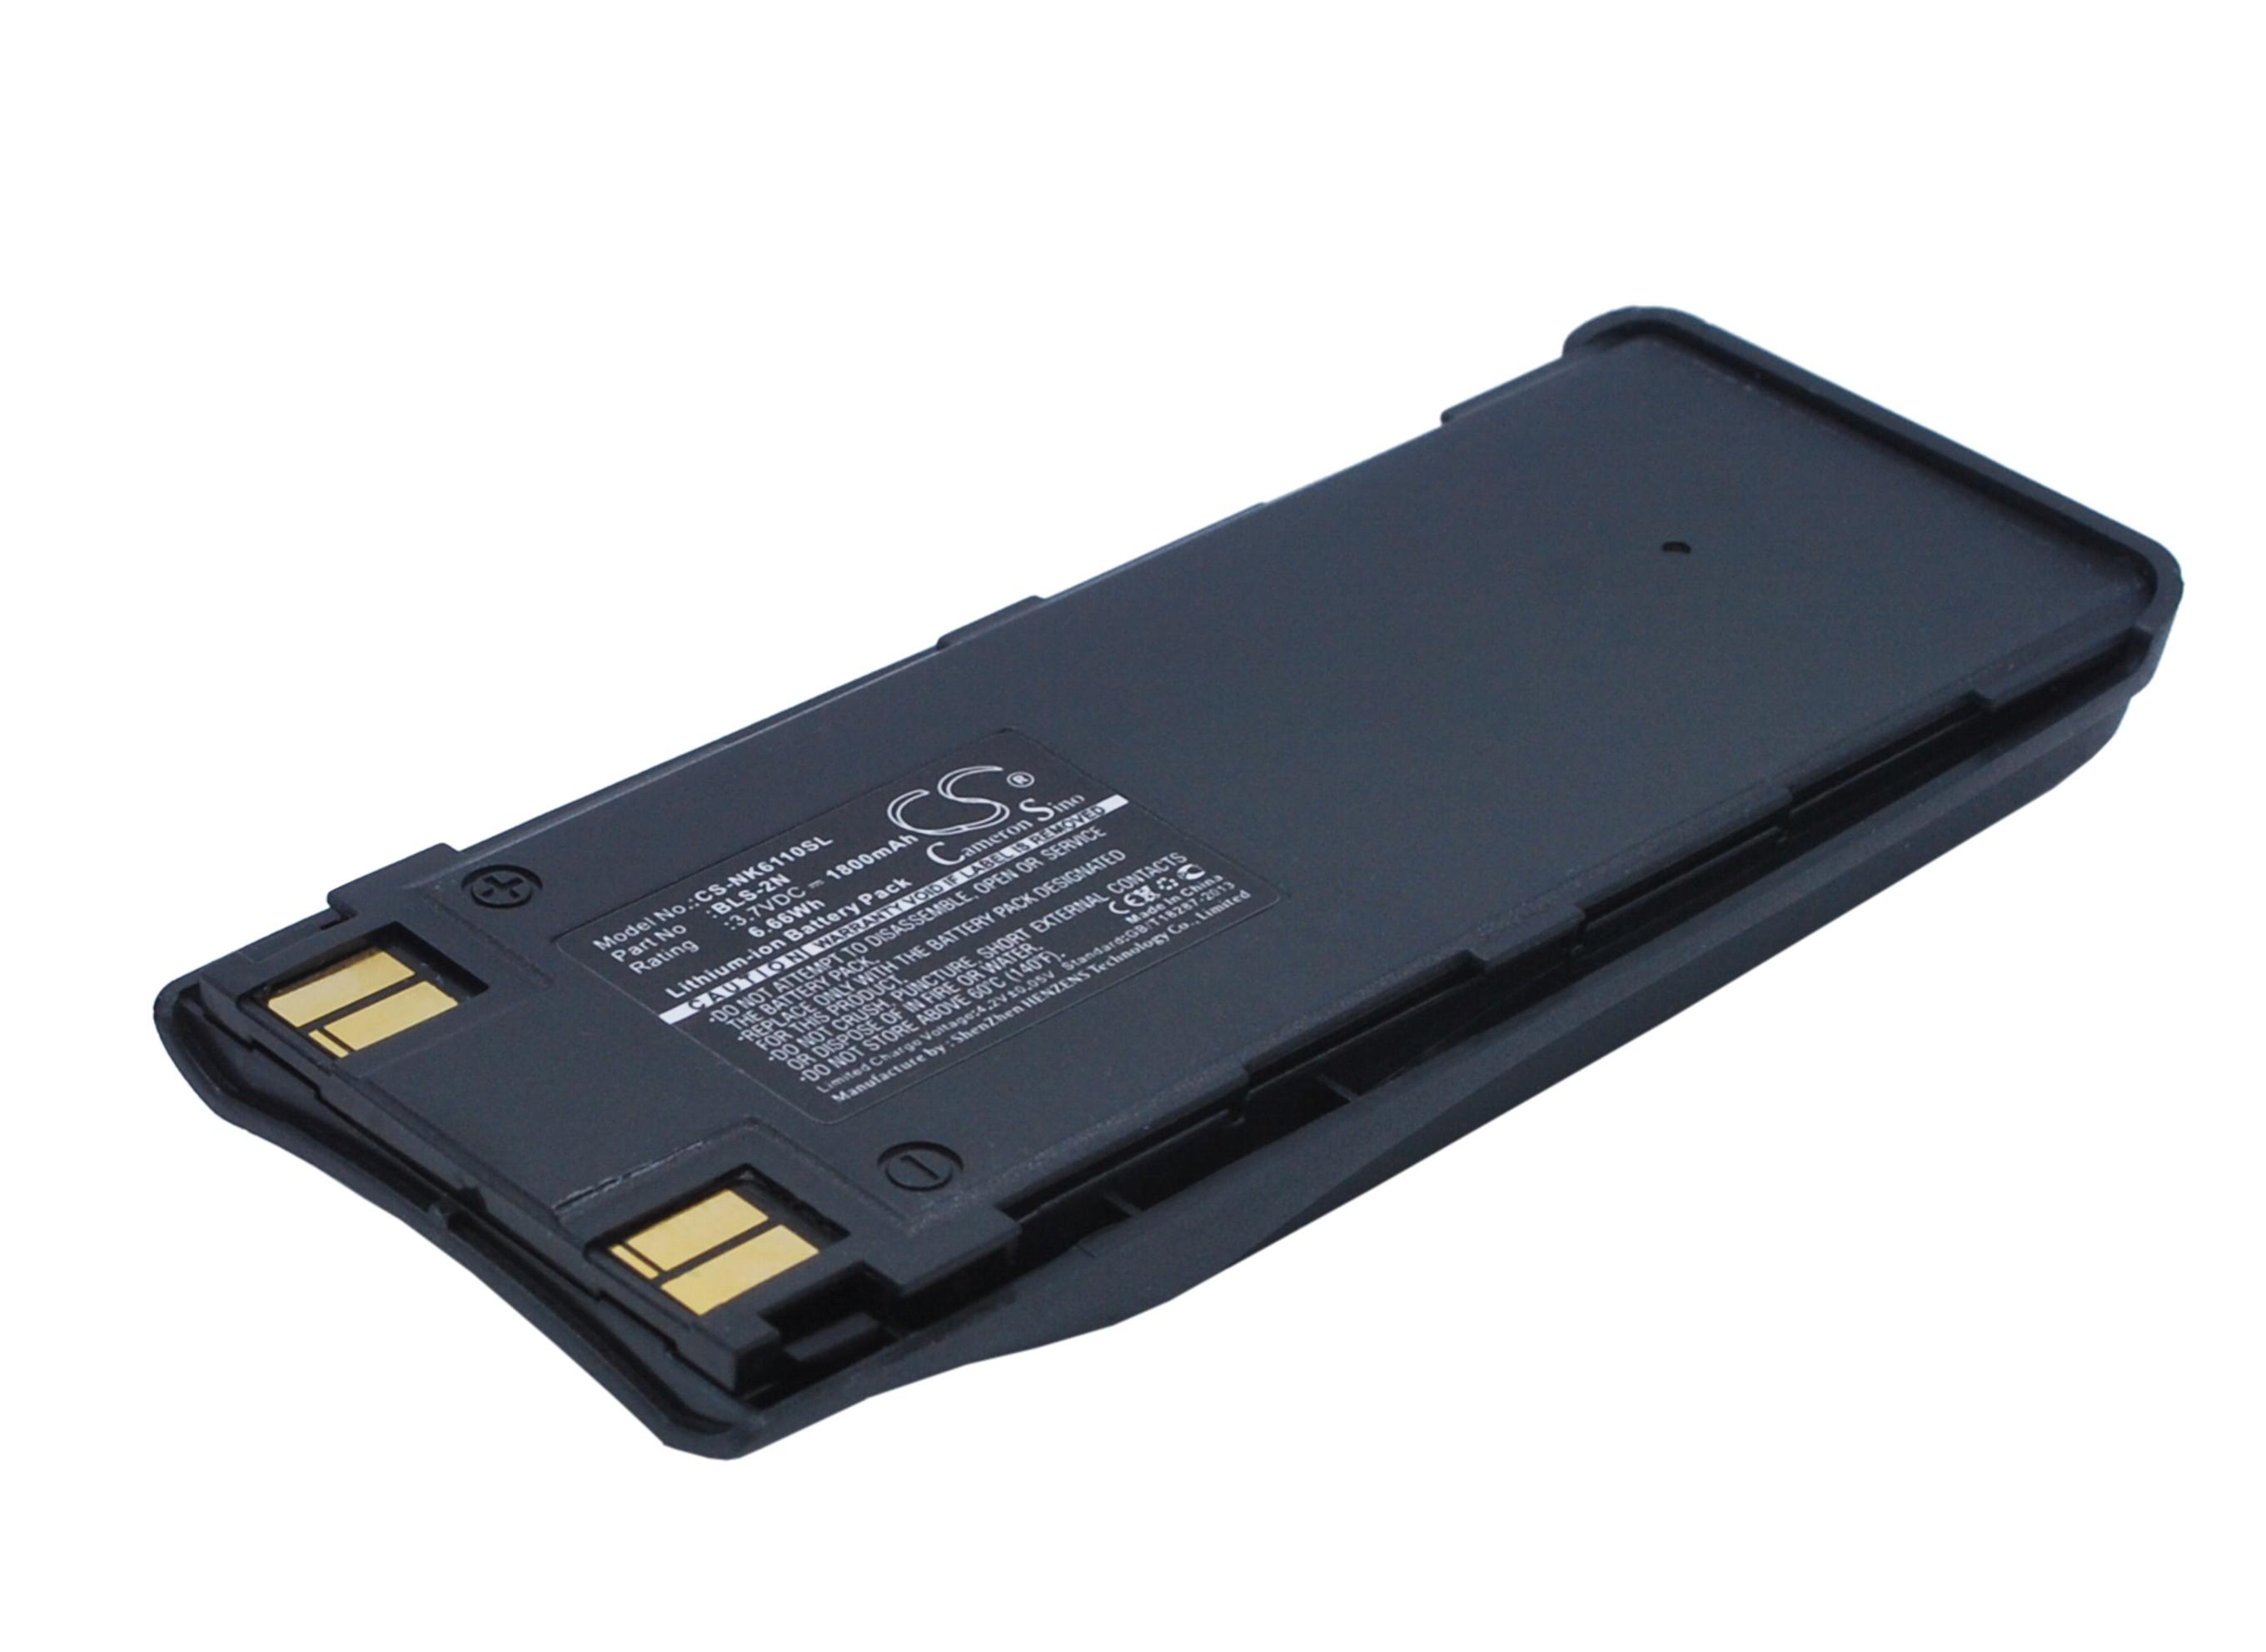 Cameron Sino baterie do mobilů pro NOKIA 5110 3.7V Li-ion 1800mAh černá - neoriginální